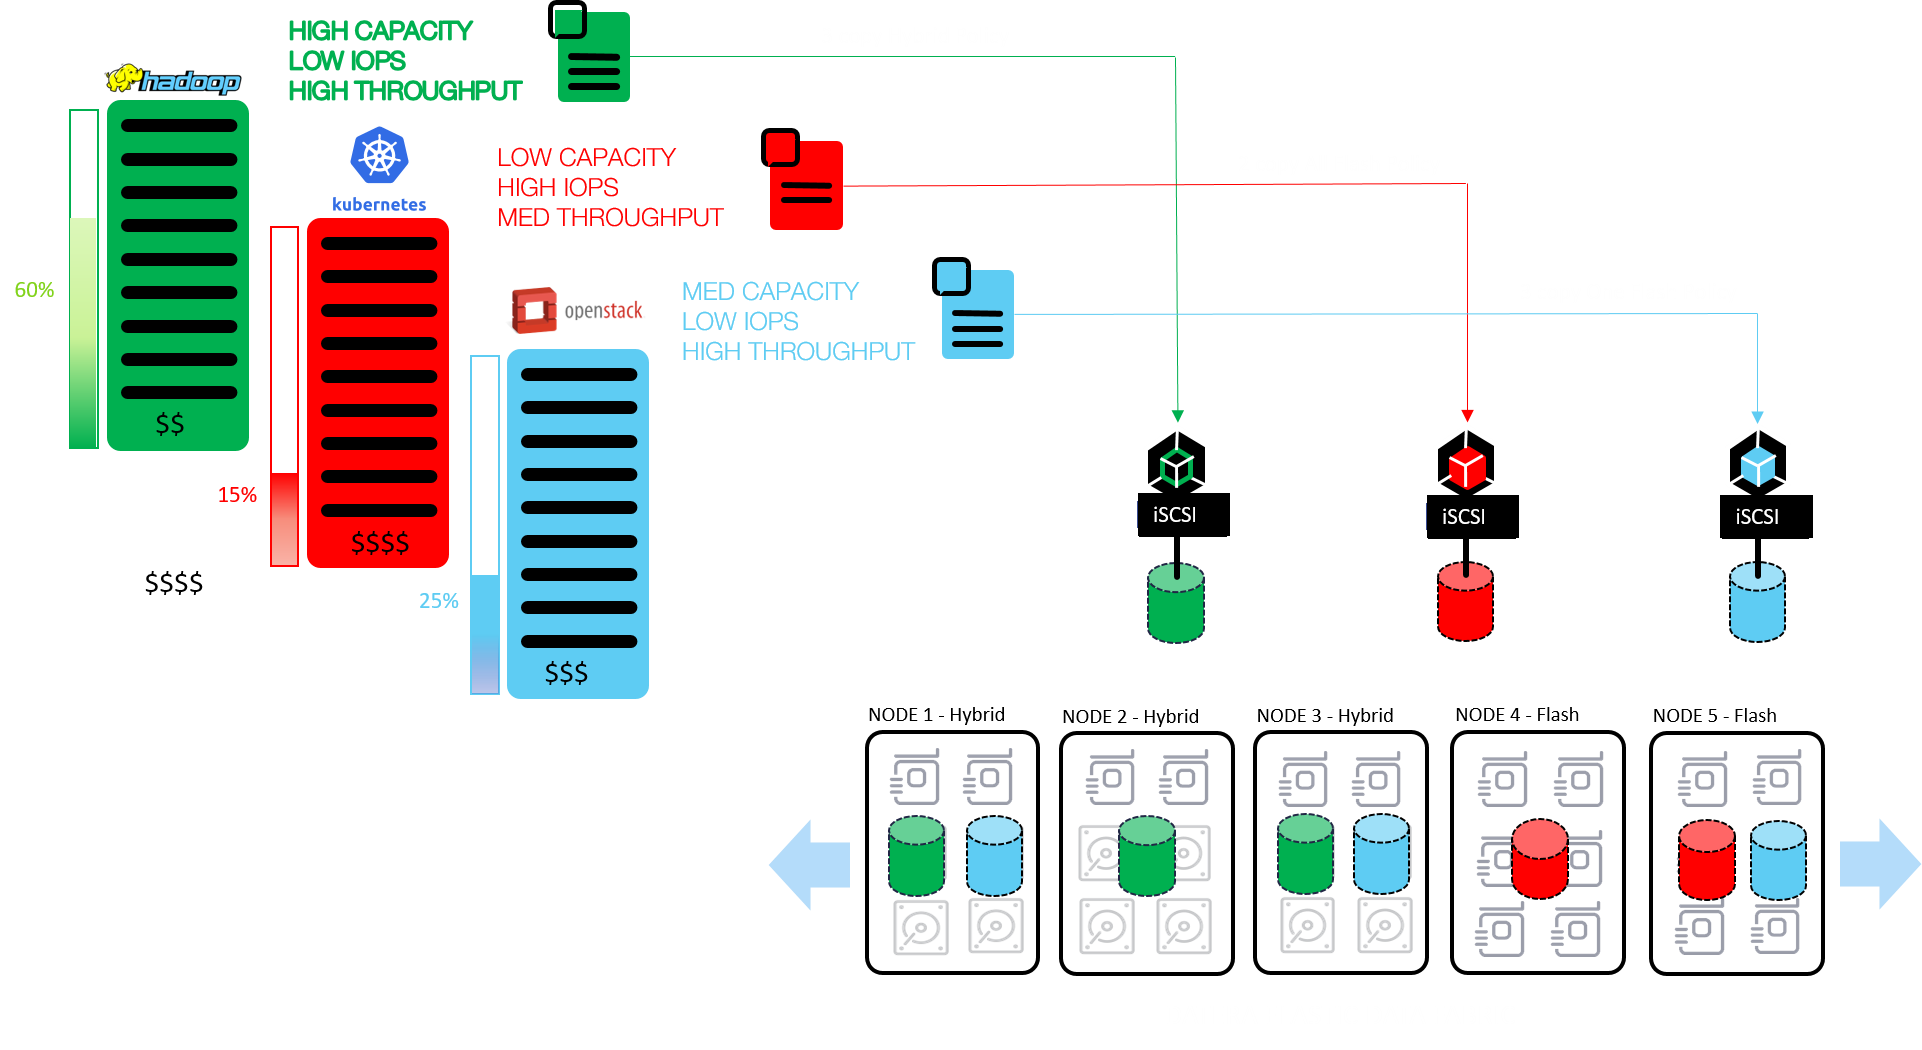 Comparing Datera Elastic Data Fabric To Ceph Storage Storage Data Storage Data